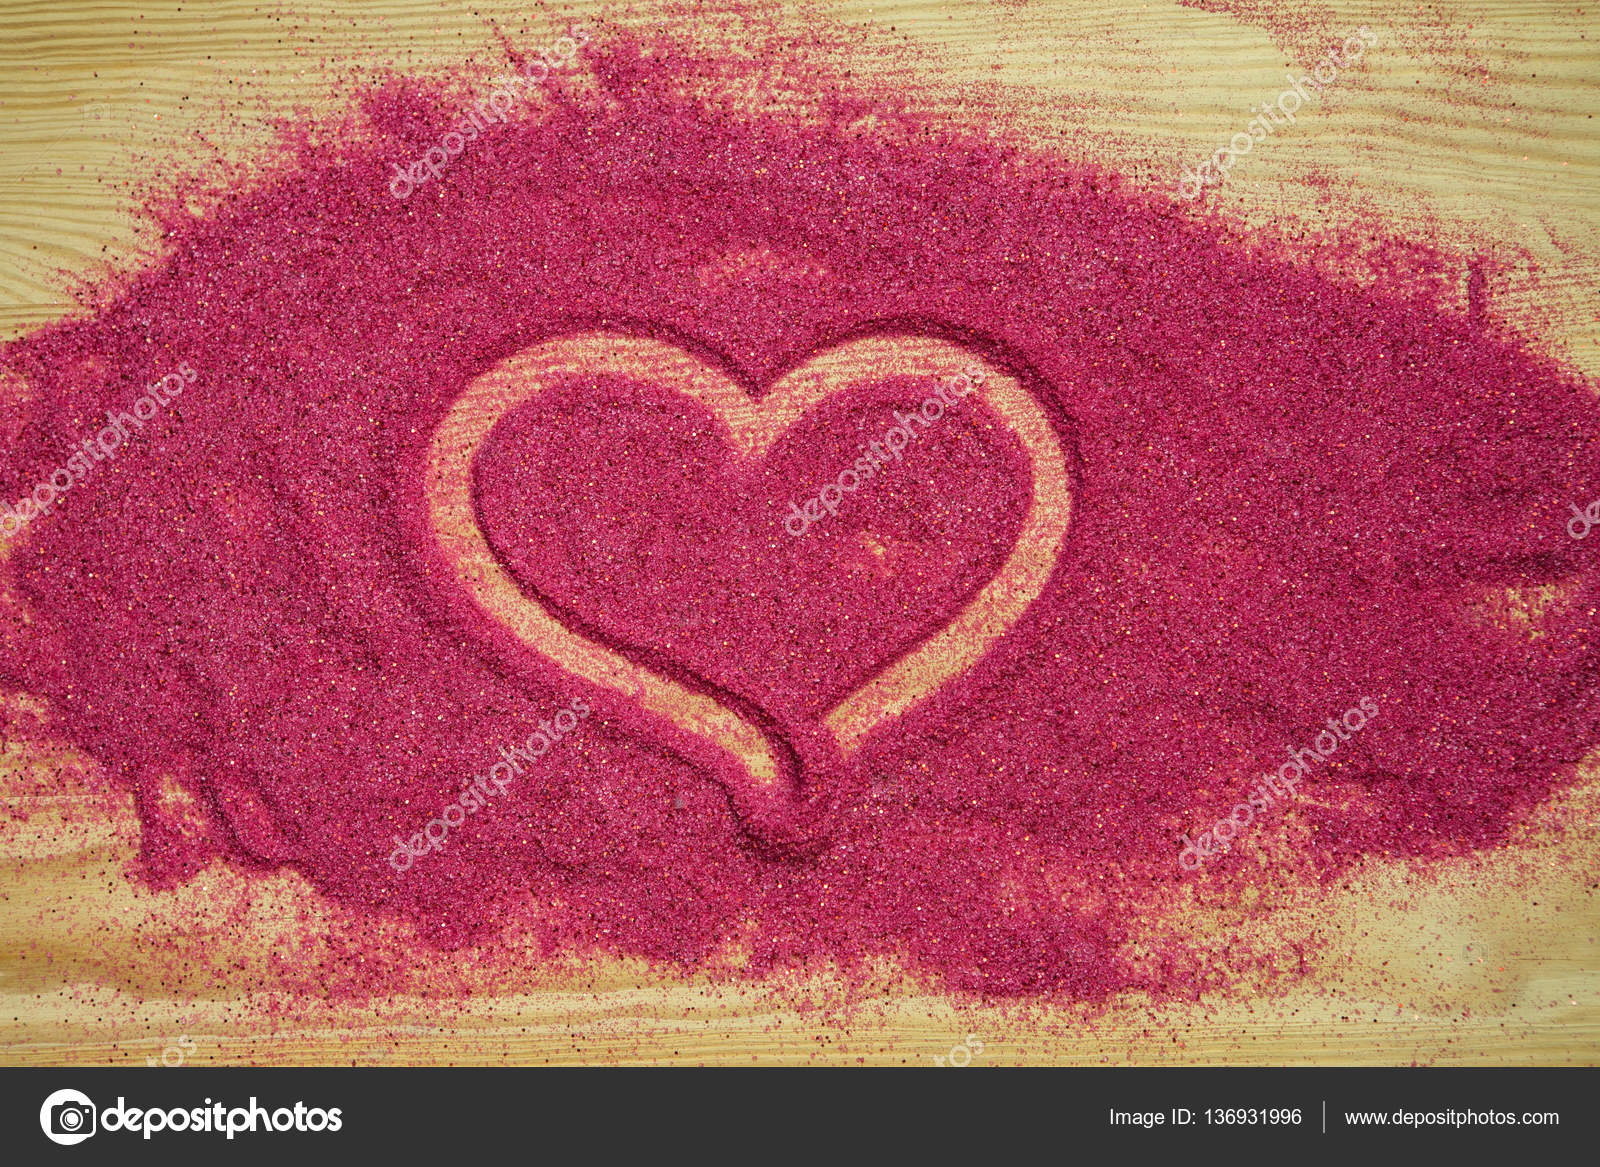 ea572e860129 Srdce na růžové barevného písku s pozlátko — Stock Fotografie ...